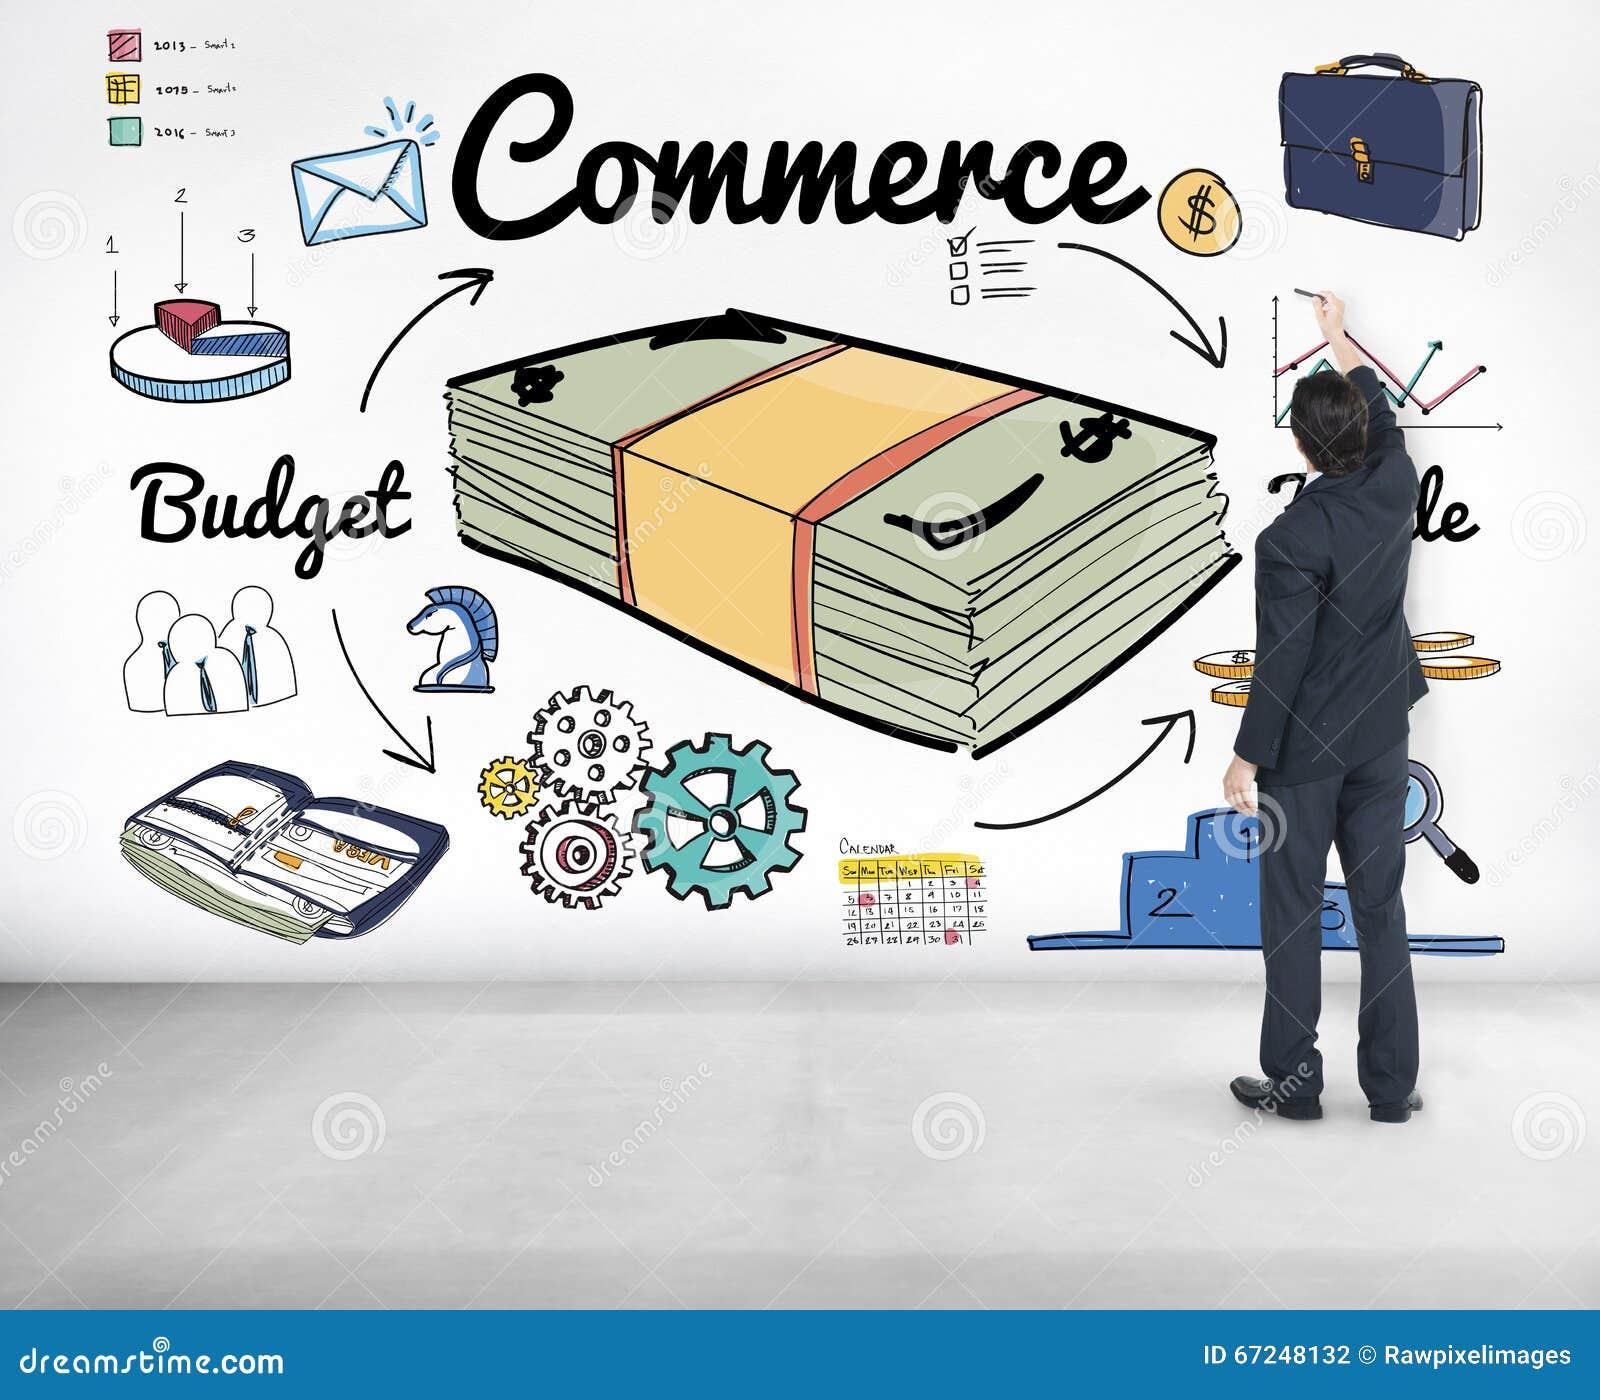 Commercial Market Retail Exchange Customer Concept Commercial Market Retail Exchange Customrer Concept